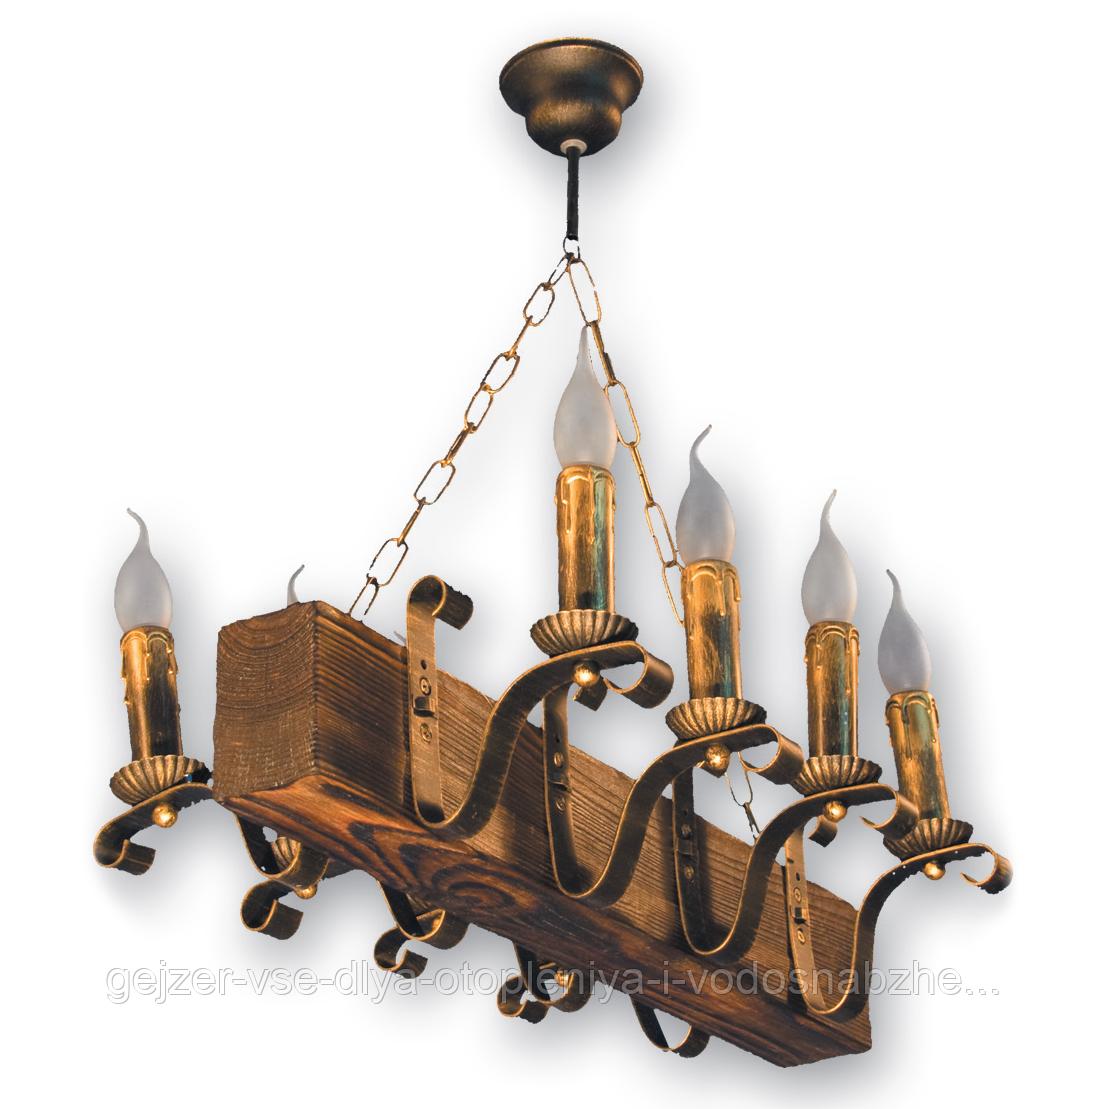 Люстра подвесная 8 свечей Е14 серии Lilia 130928